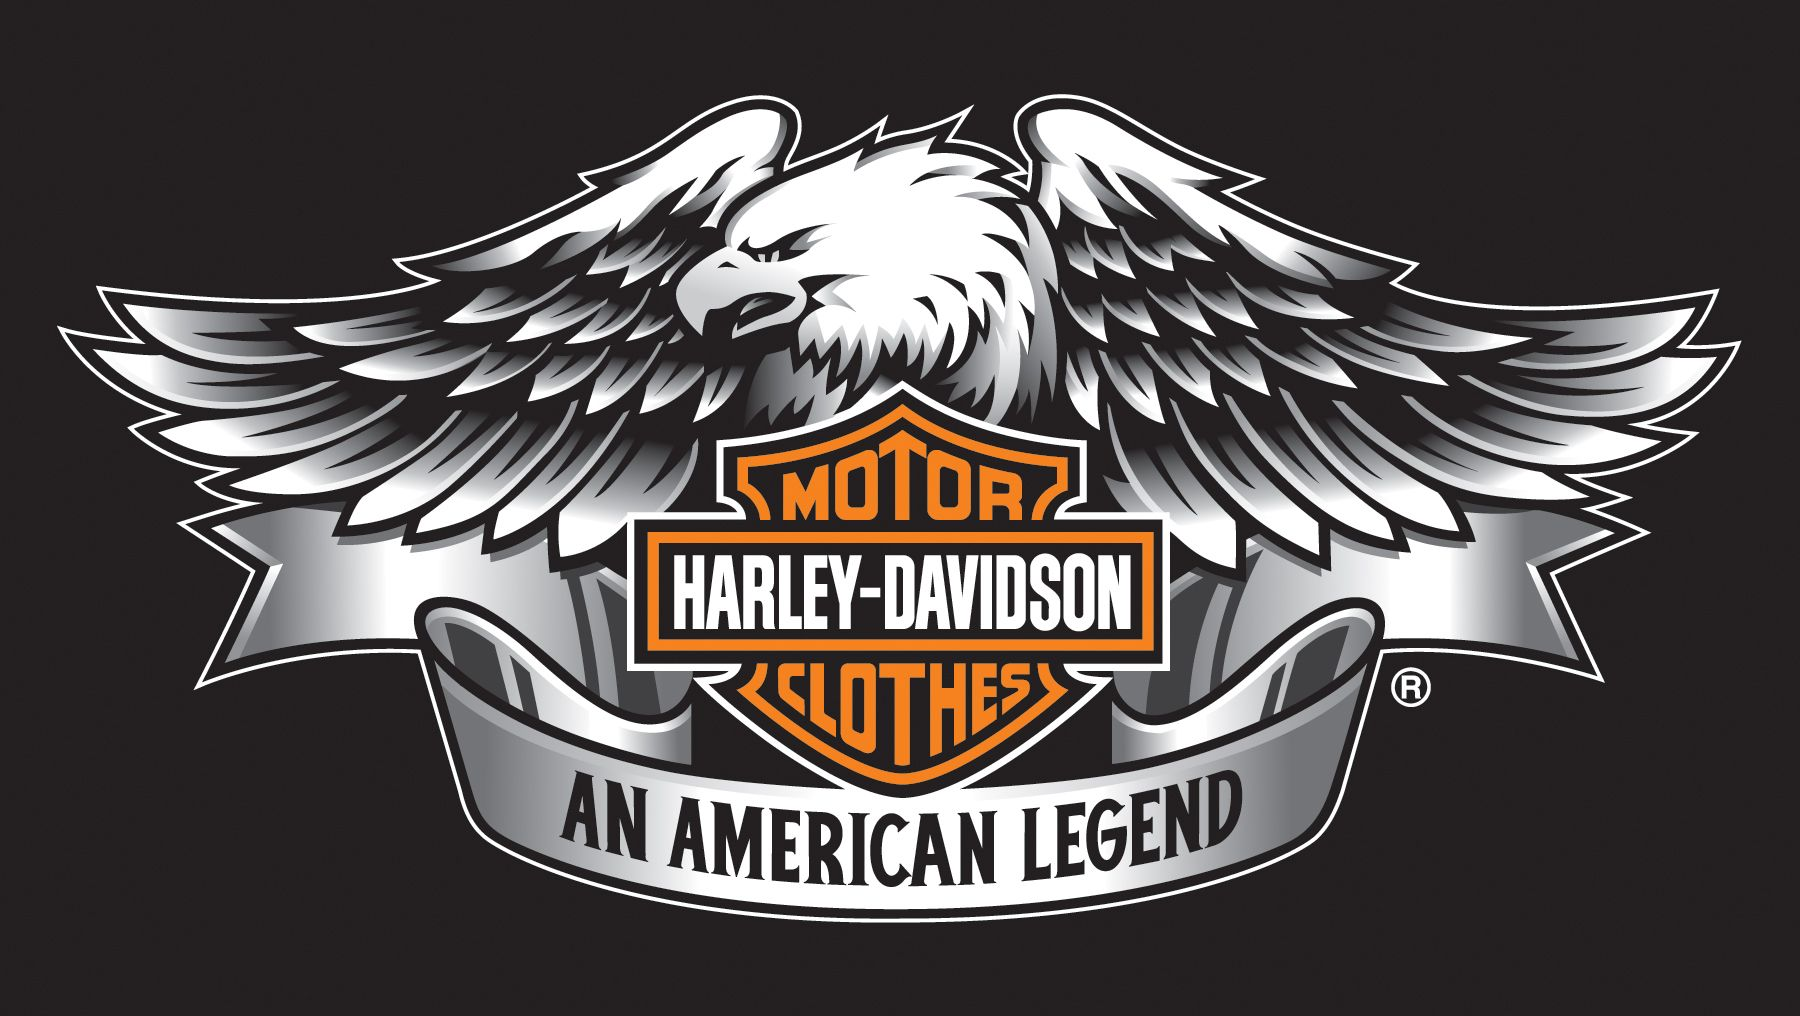 harley davidson logo Motos harley davidson